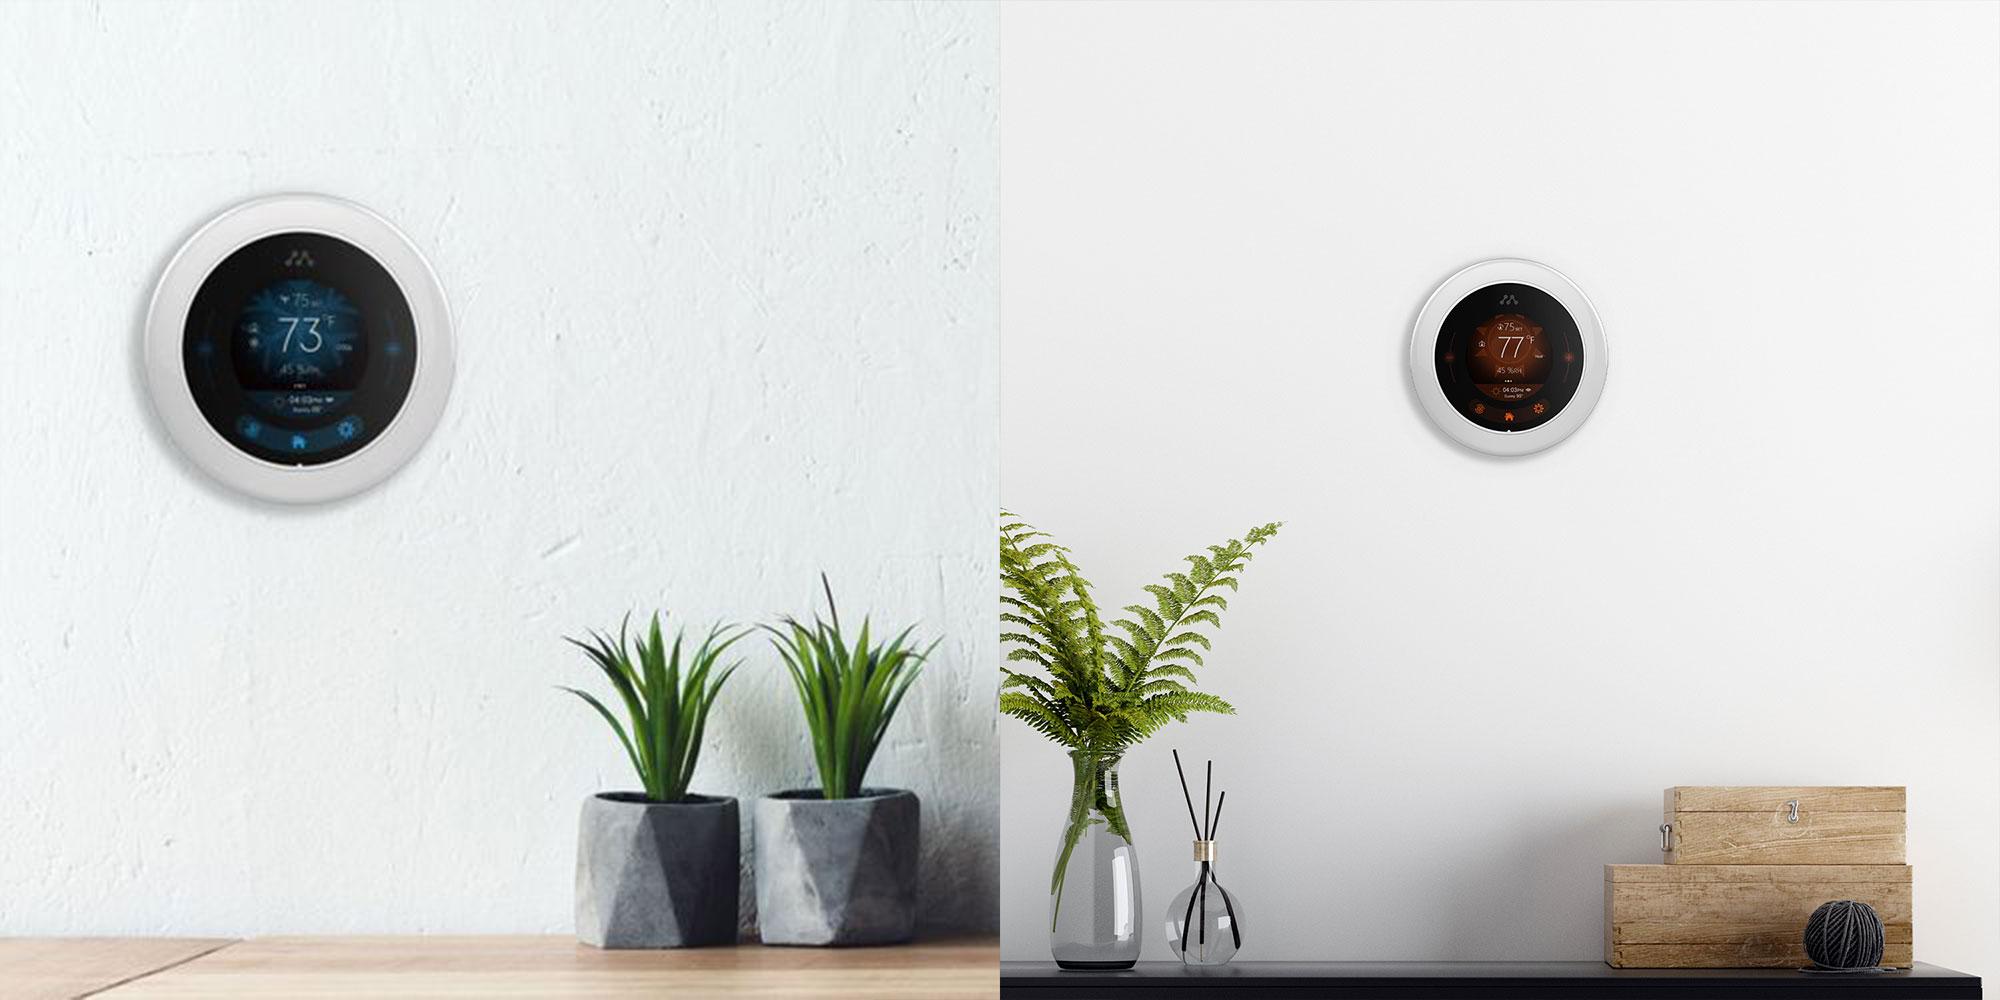 momentum meri wi-fi smart thermostat